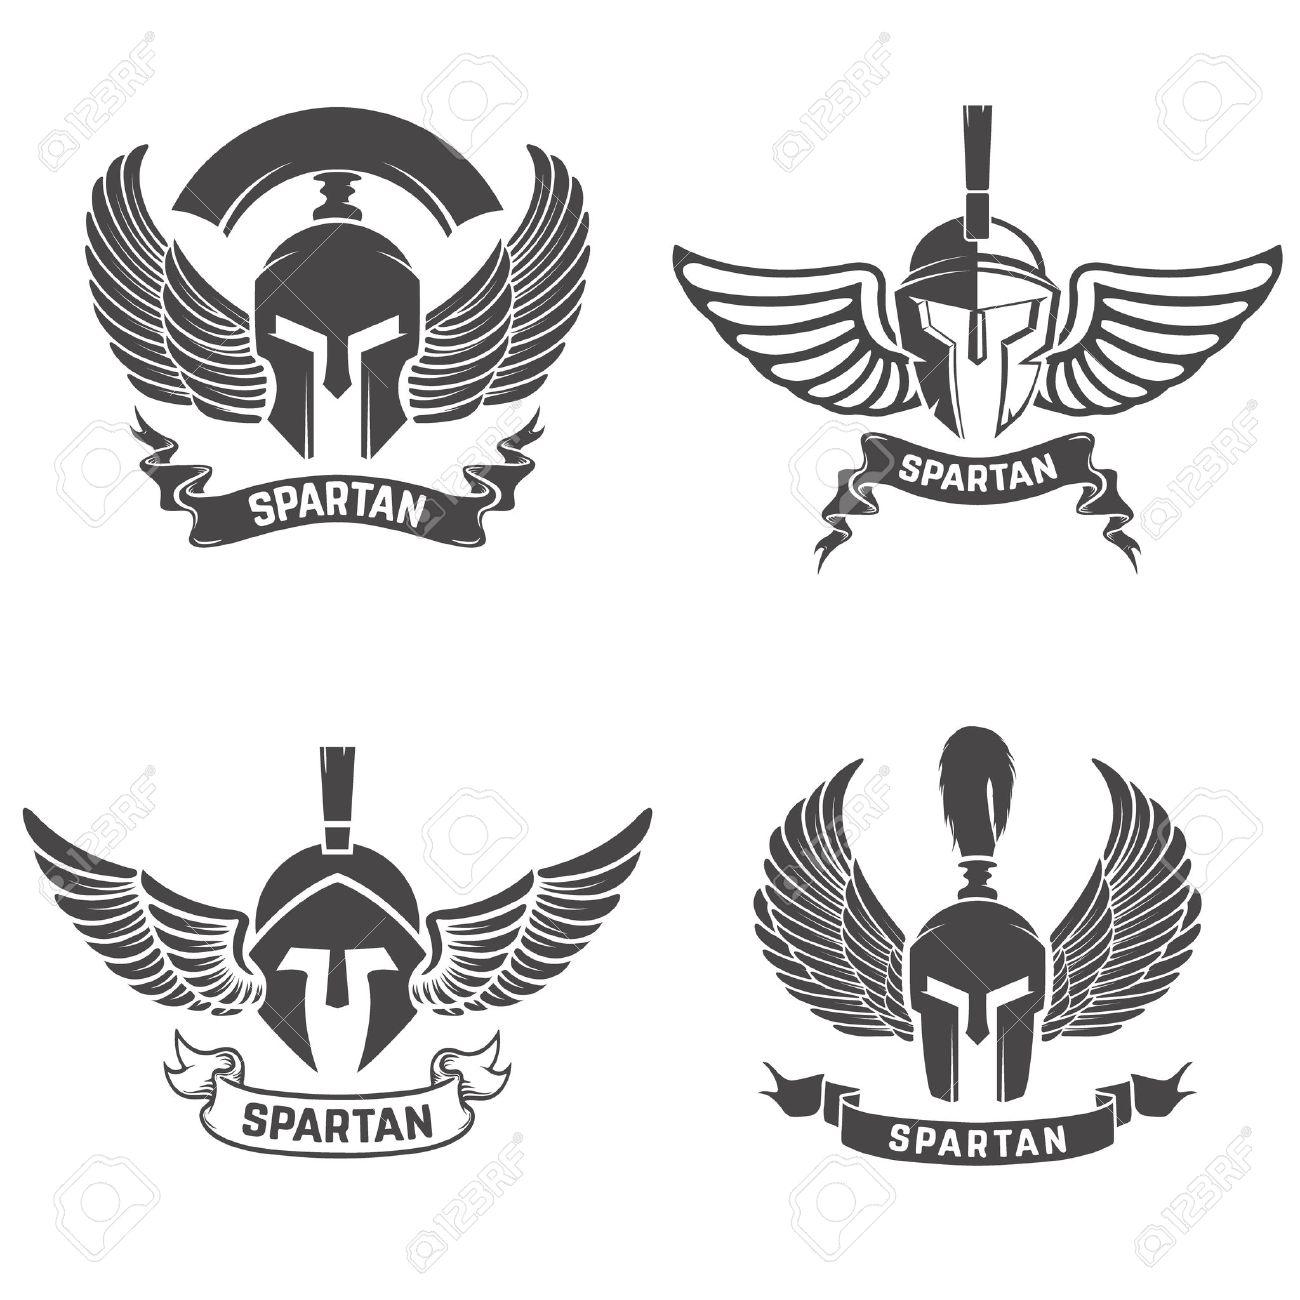 Set of the spartan helmets with wings. Design elements for logo, label, emblem, sign, brand mark. Vector illustration. - 62196087